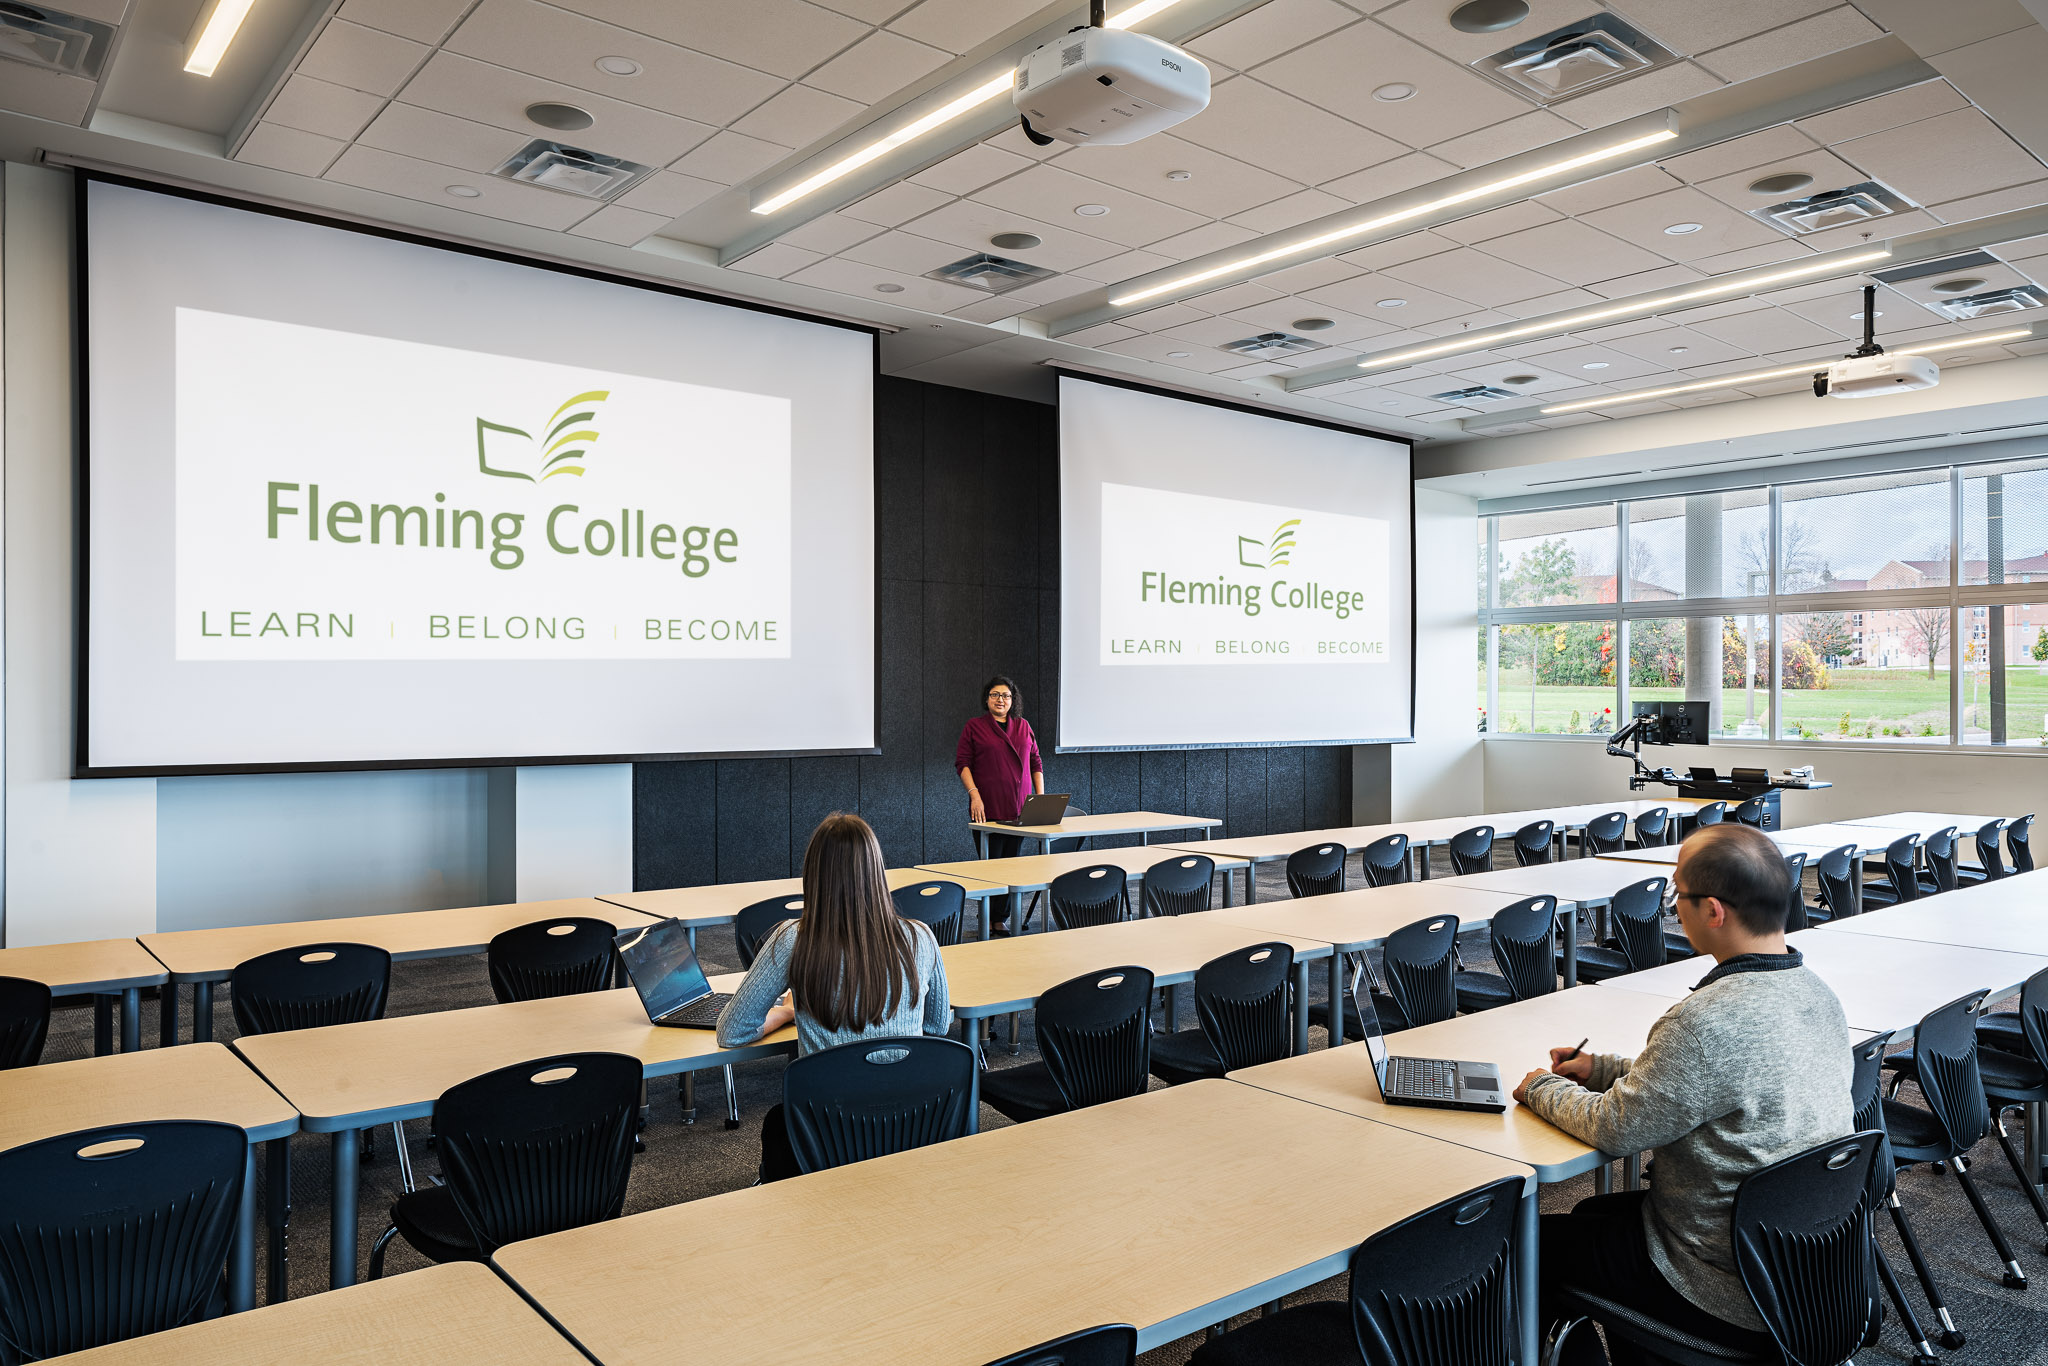 Fleming College 02 2048.jpg